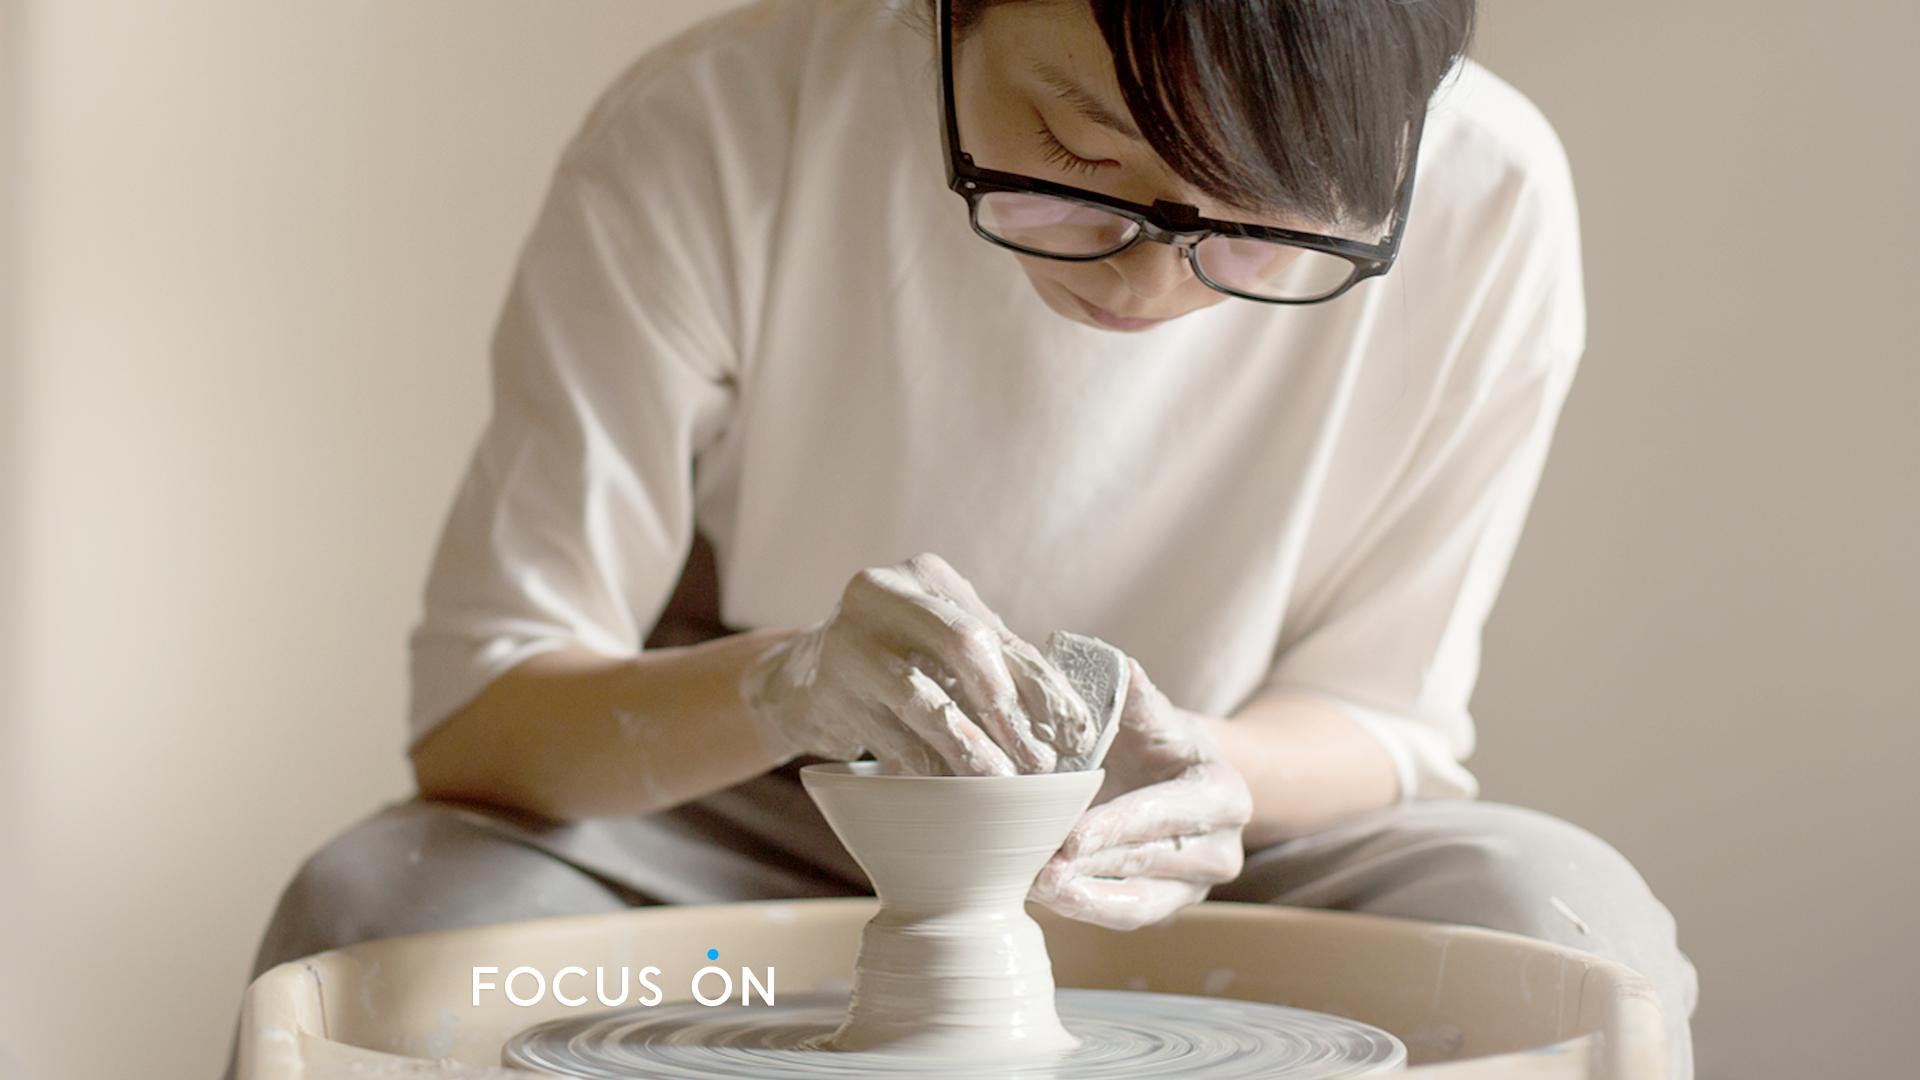 Pottery_Lifestyle_3.jpg